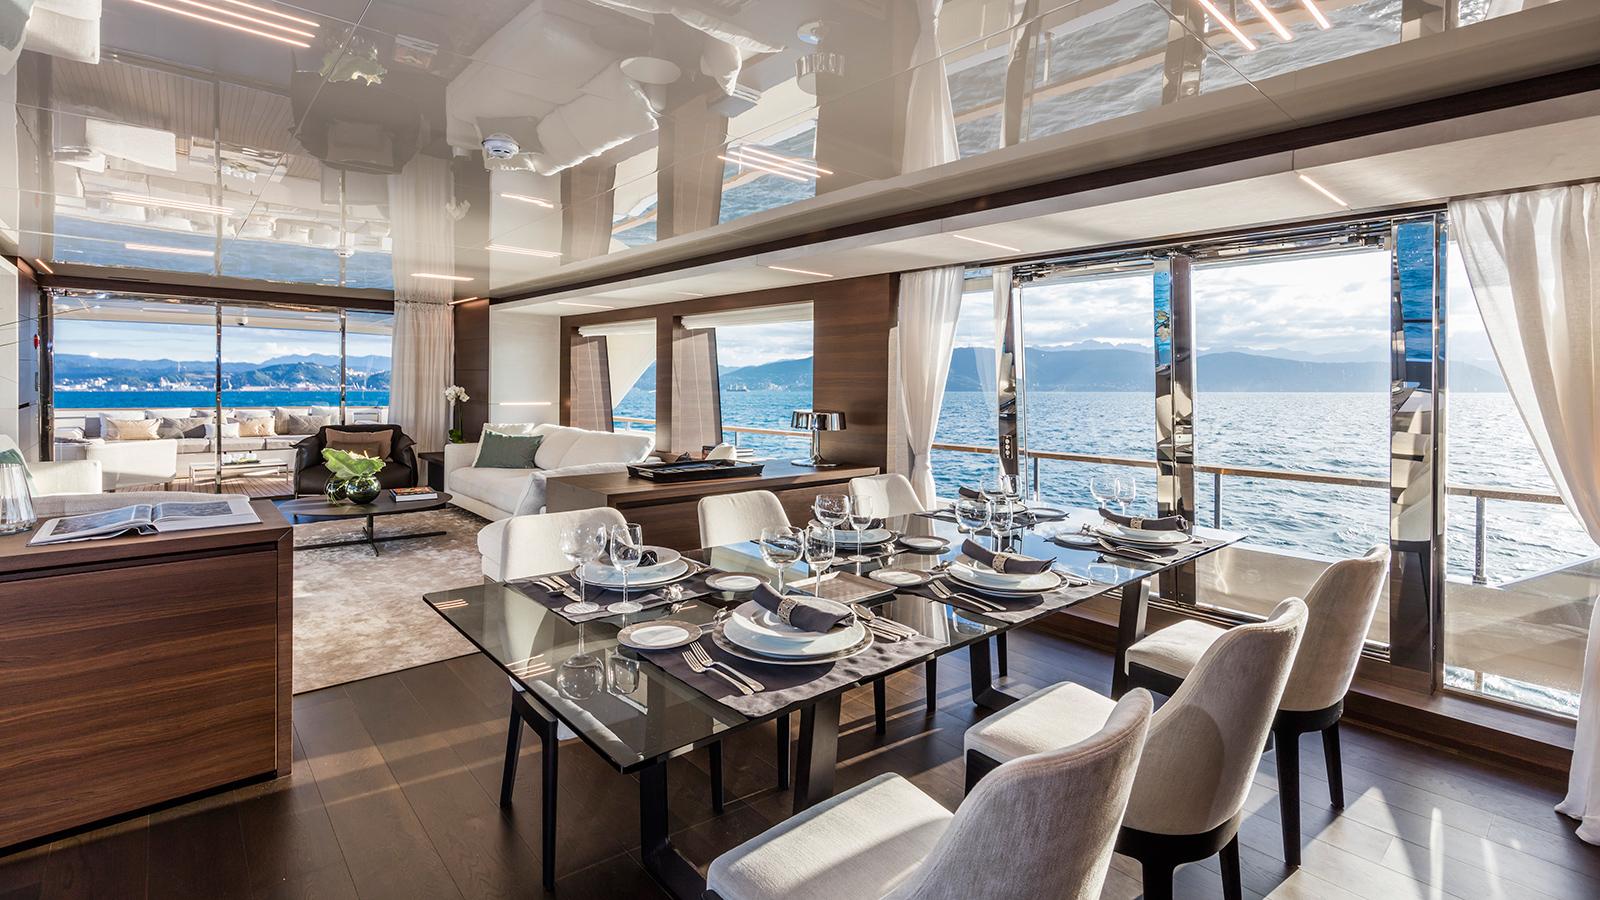 the-dining-area-of-the-custom-line-navetta-37-superyacht